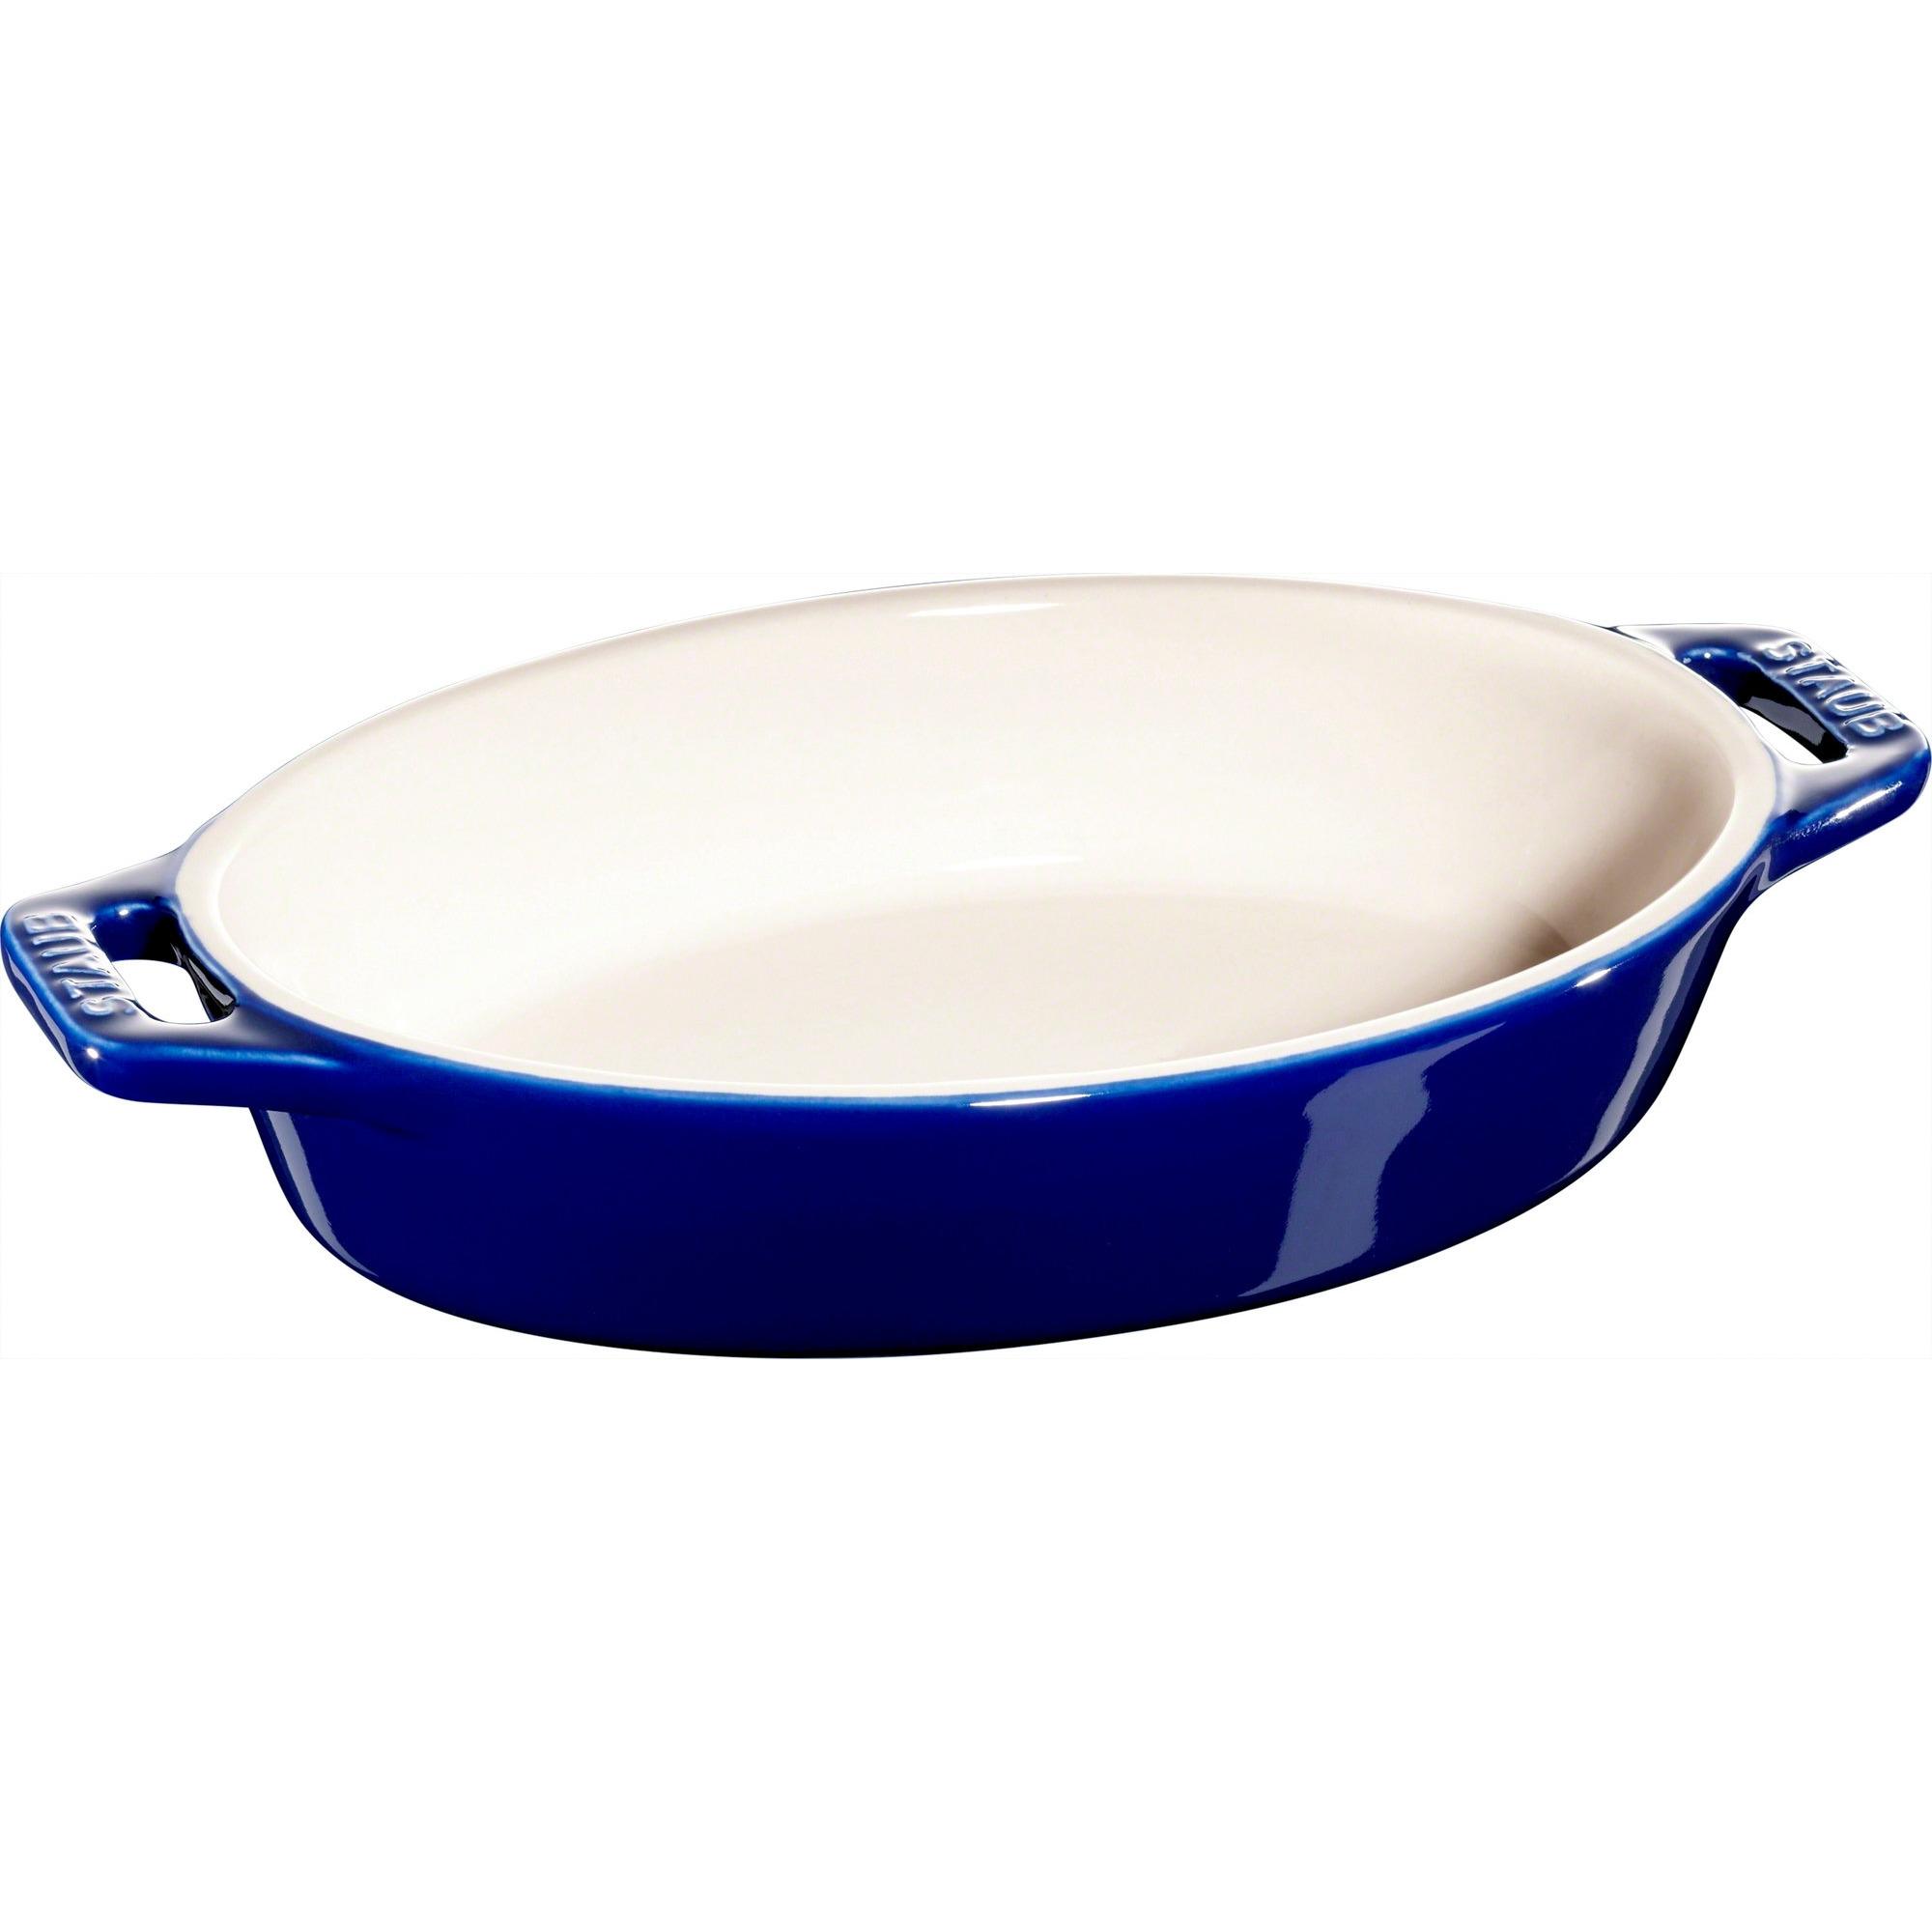 Staub Oval Form 17 cm Blå